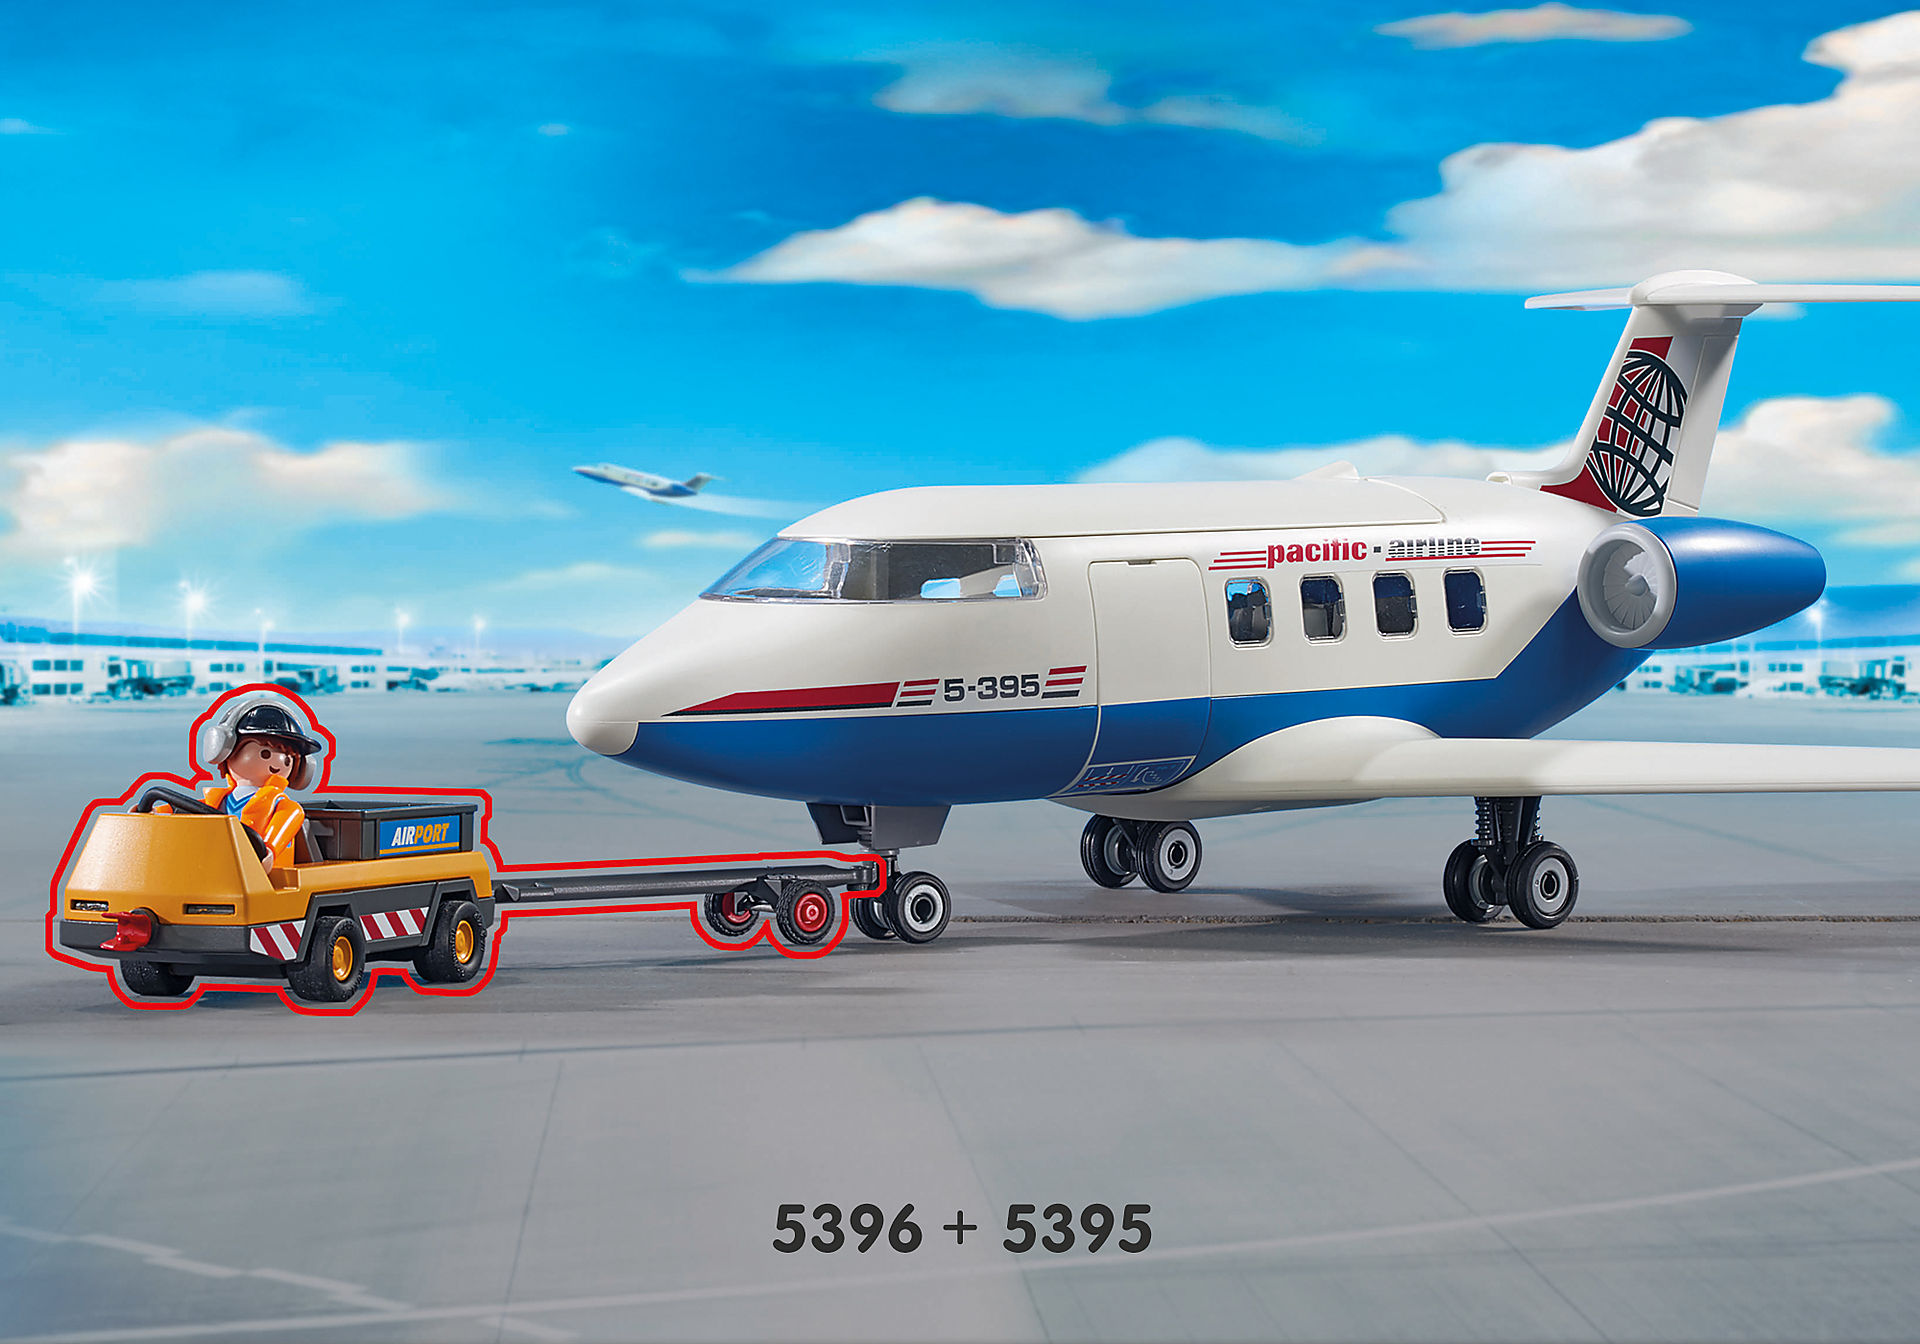 5396 Holownik samolotu z kontrolerem ruchu zoom image6